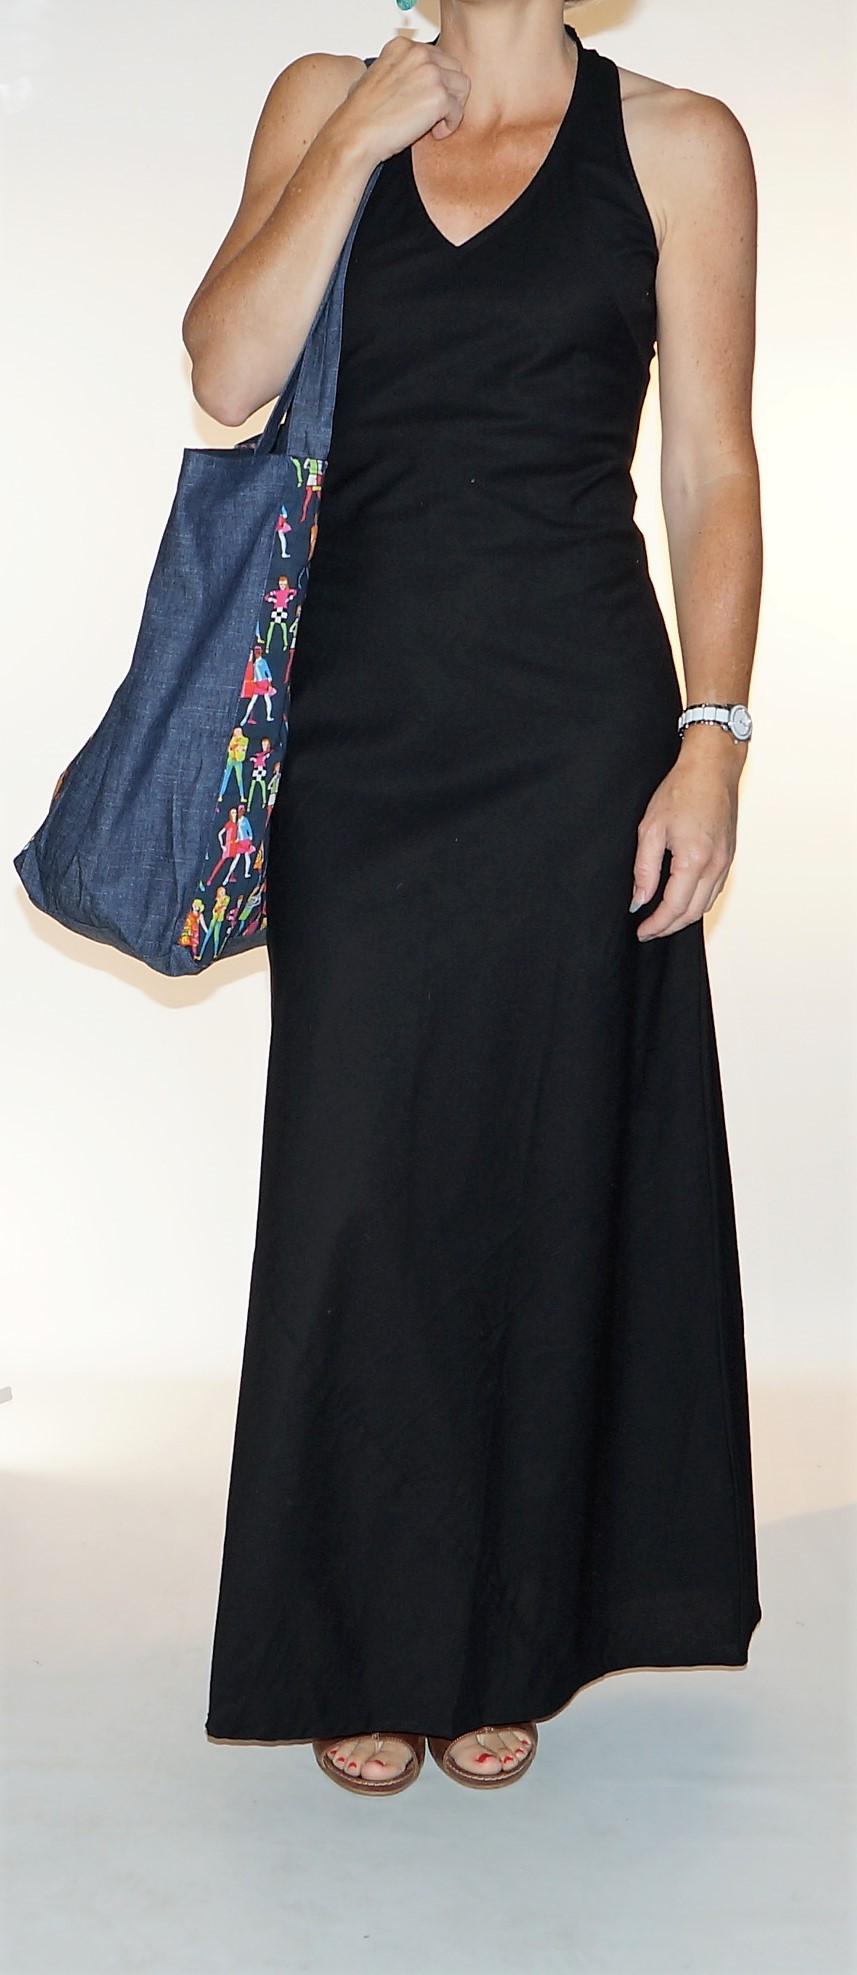 Grand sac shopping Imprimé Femmes Bla-Bla